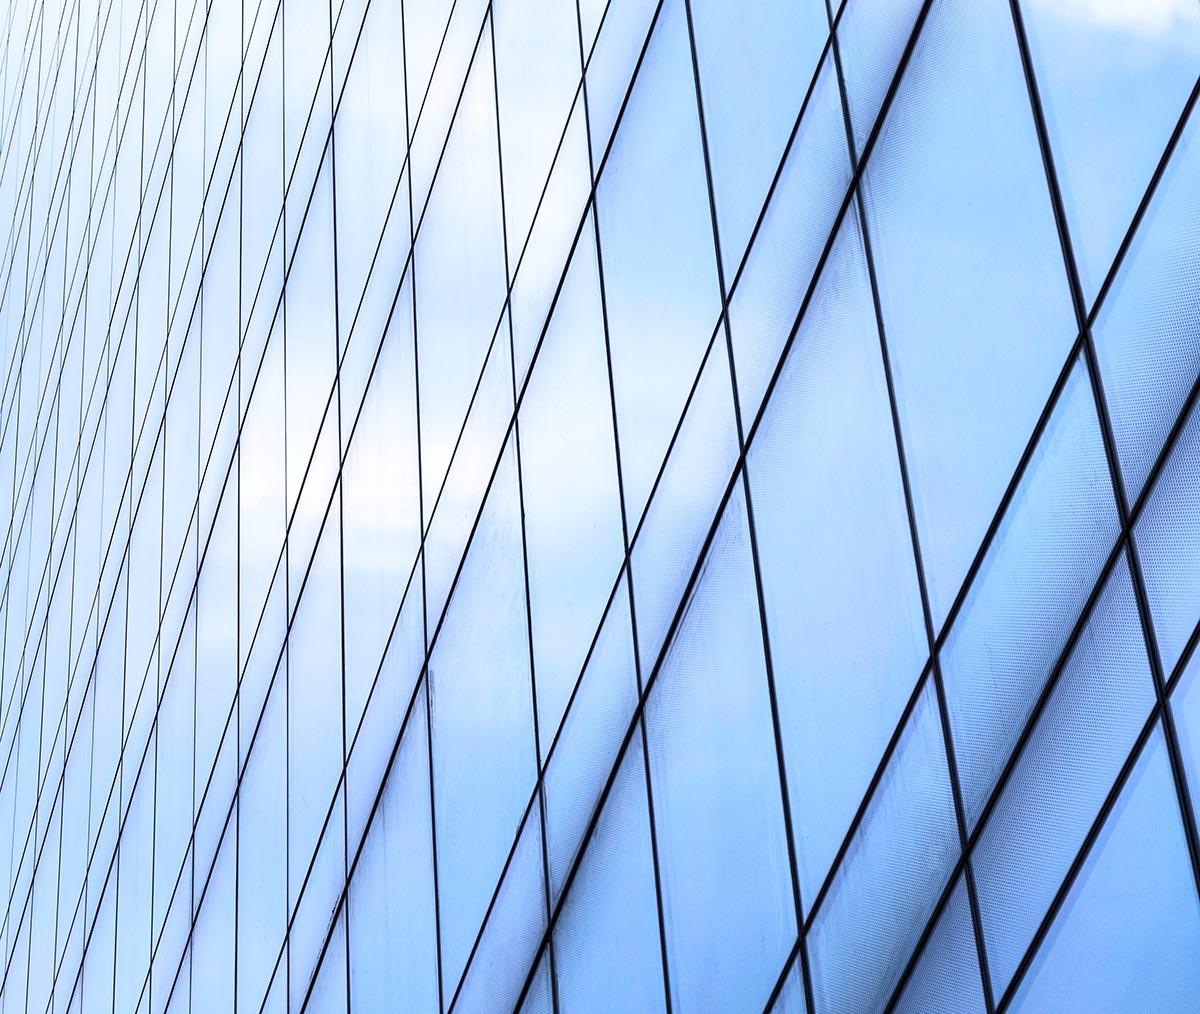 Free stock photo Diagonal pattern of office building windows